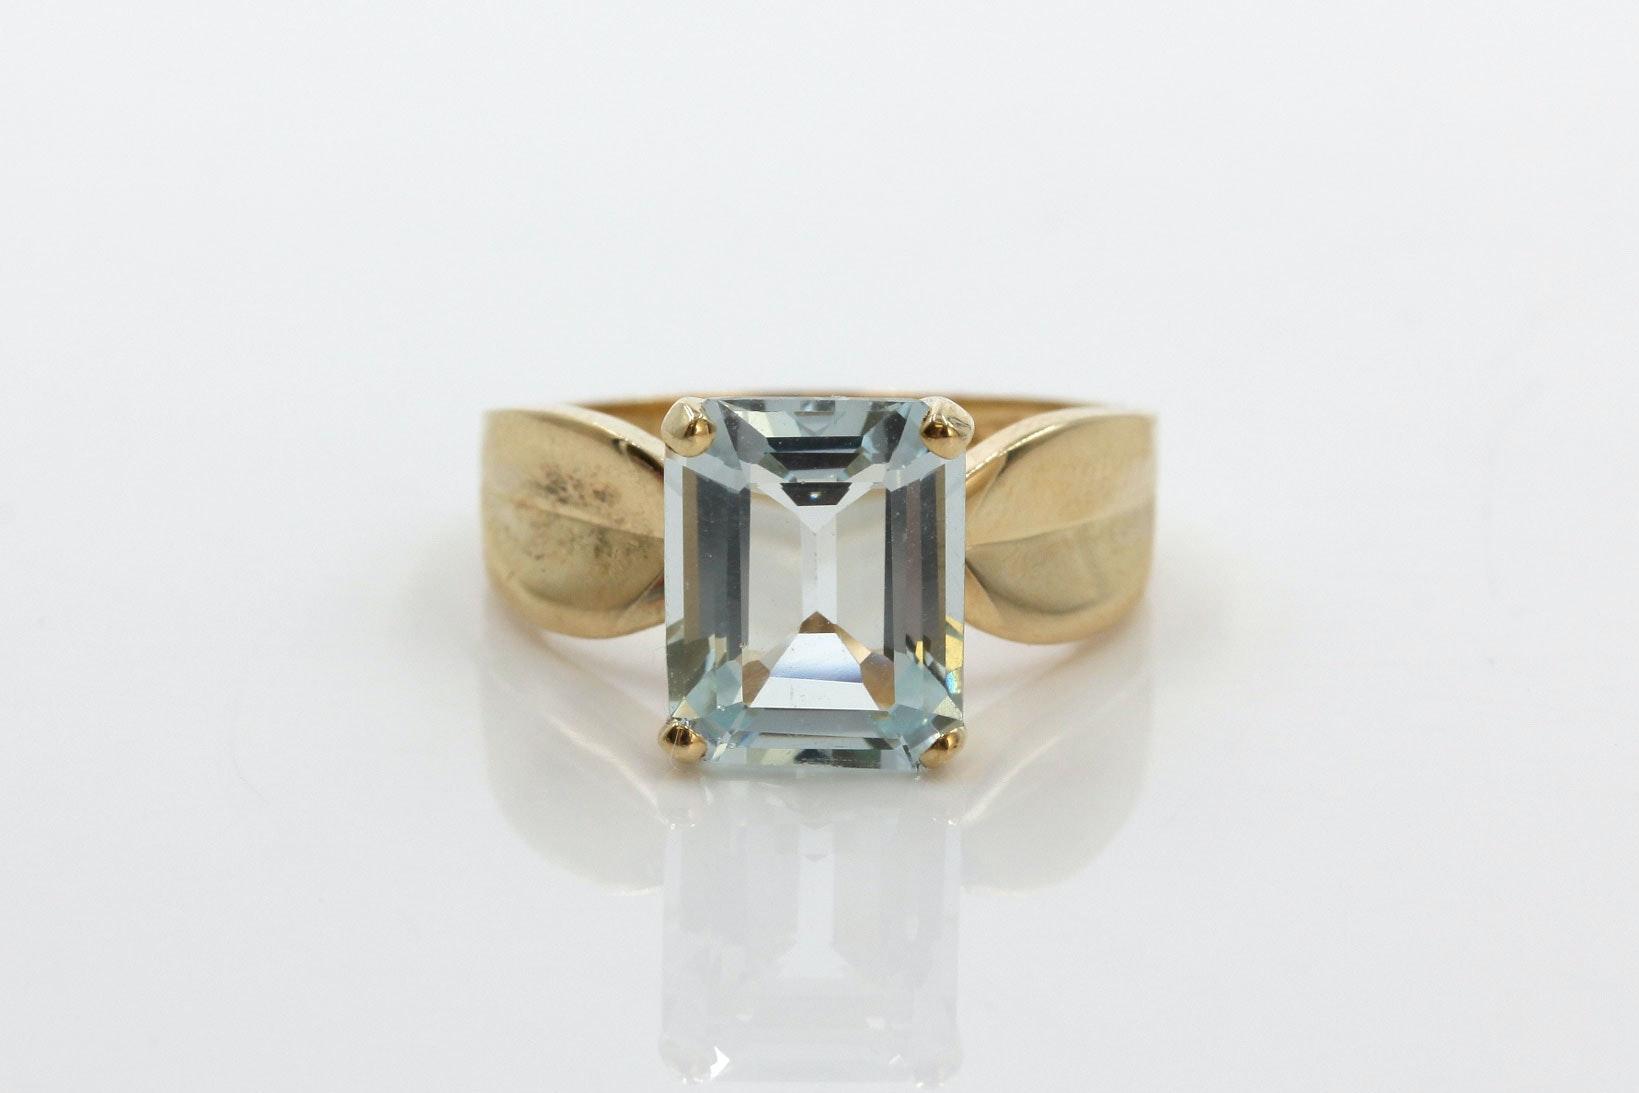 14K Yellow Gold 2.30 CTS Aquamarine Ring